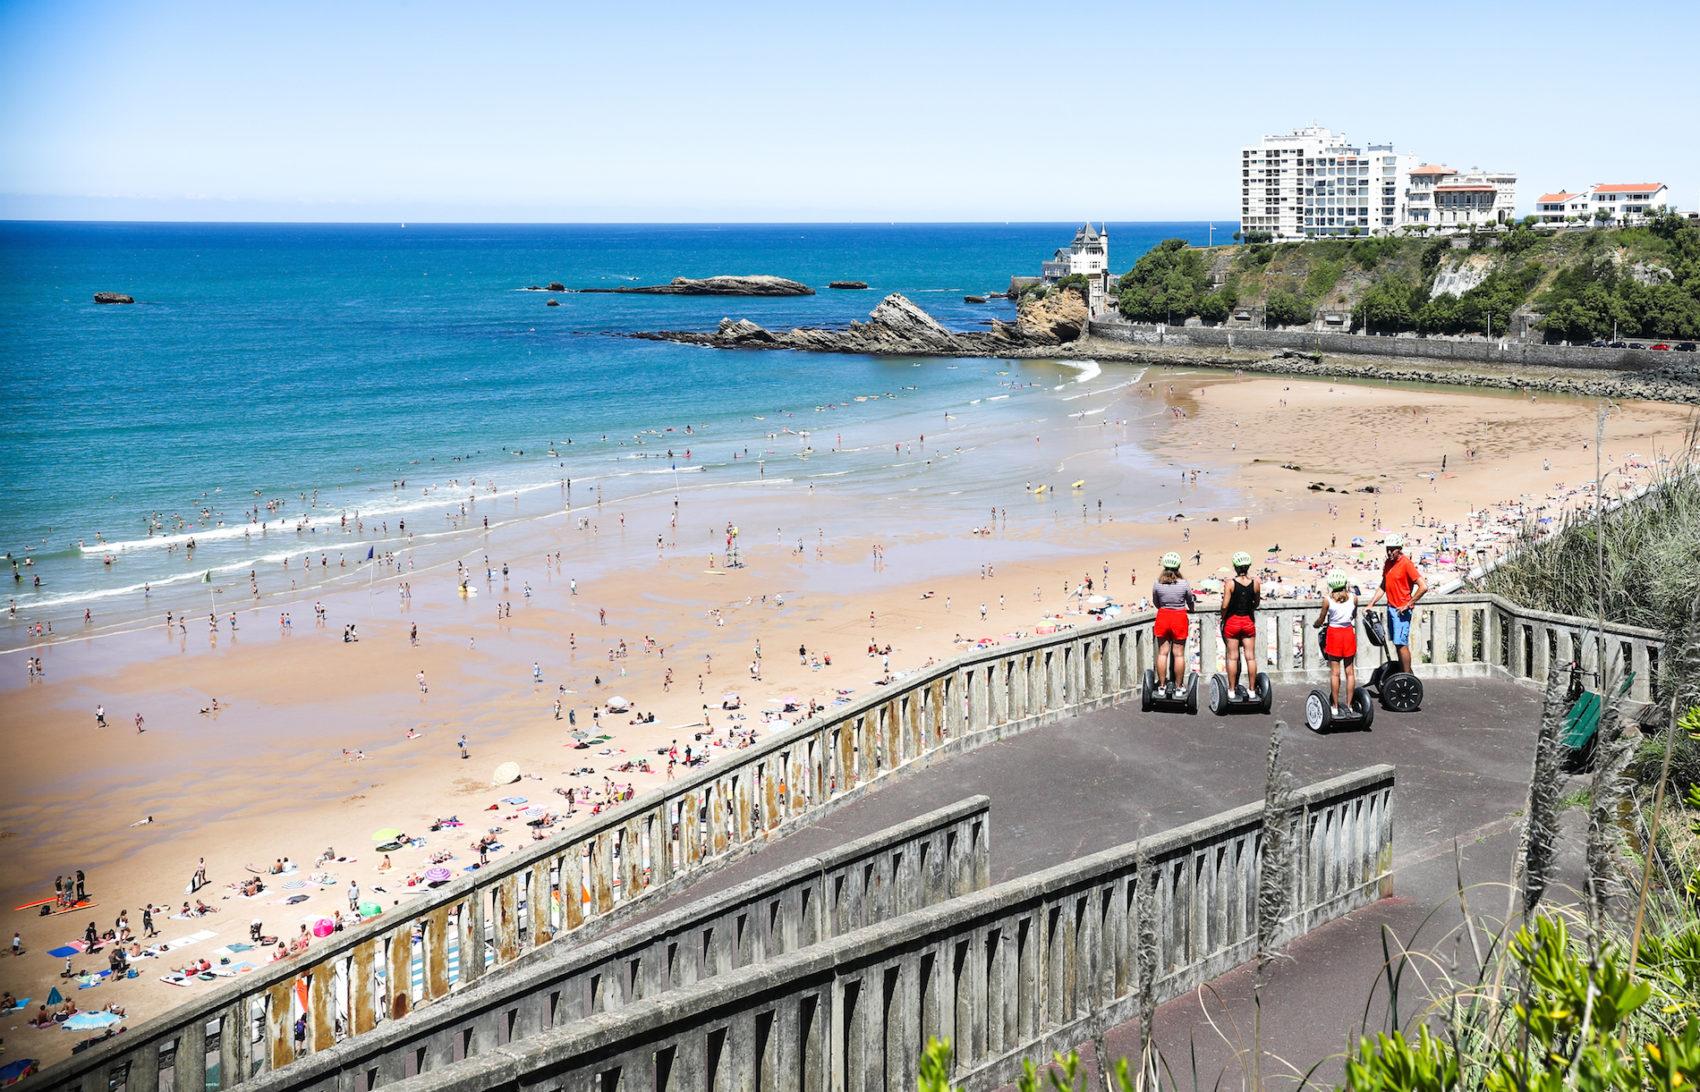 visiter-biarritz-cote-des-basque-gyropode-velo-electrique